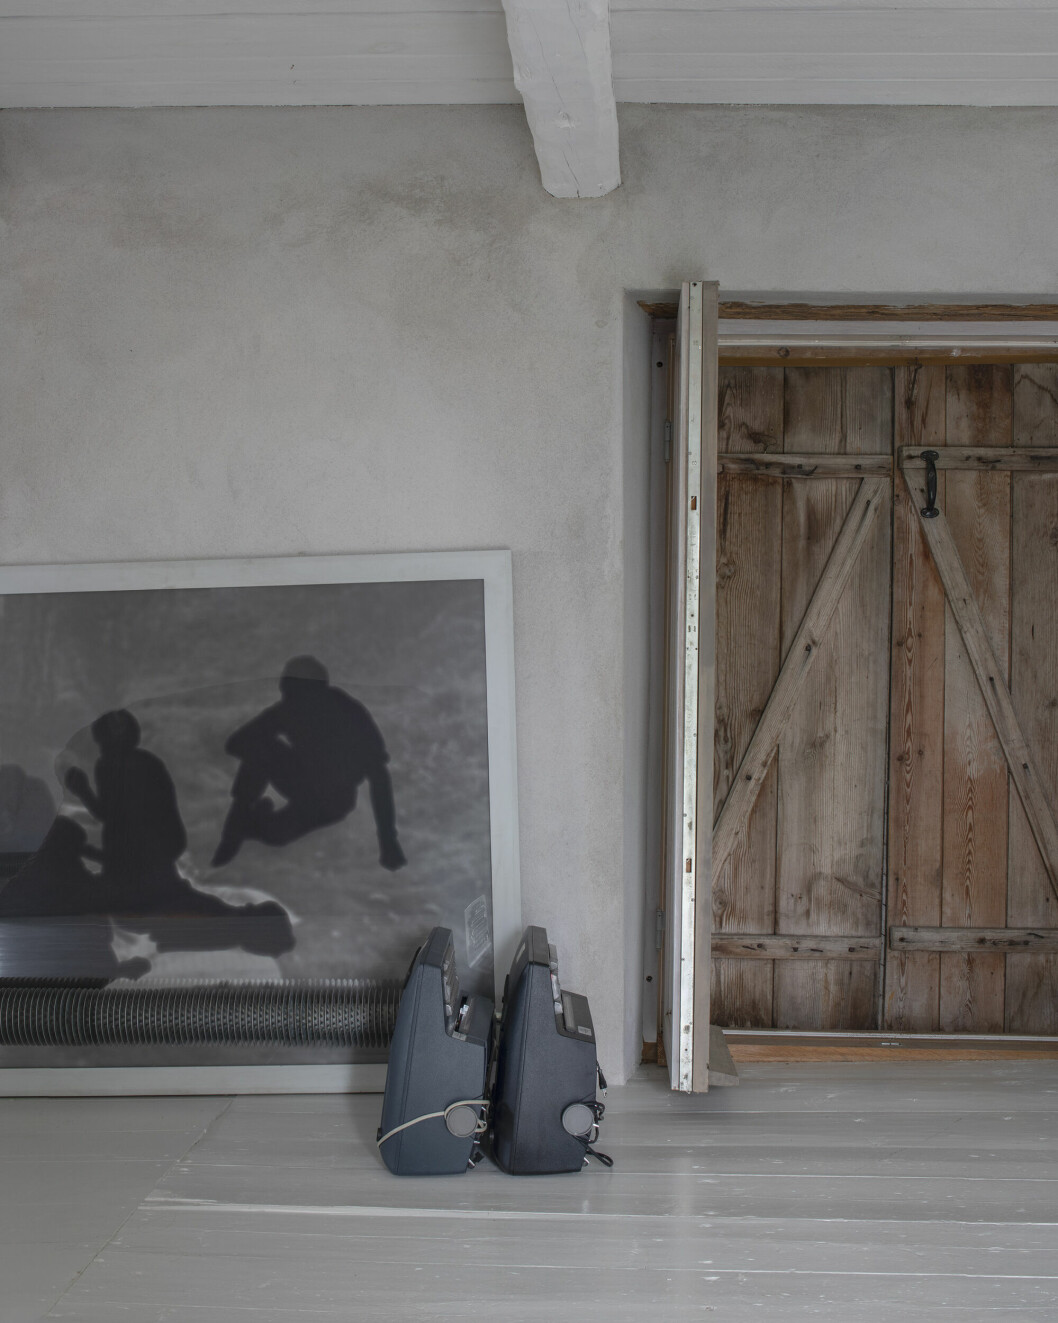 Maria Miesenbergers fotografi stod på golvet i huset på Gotland.